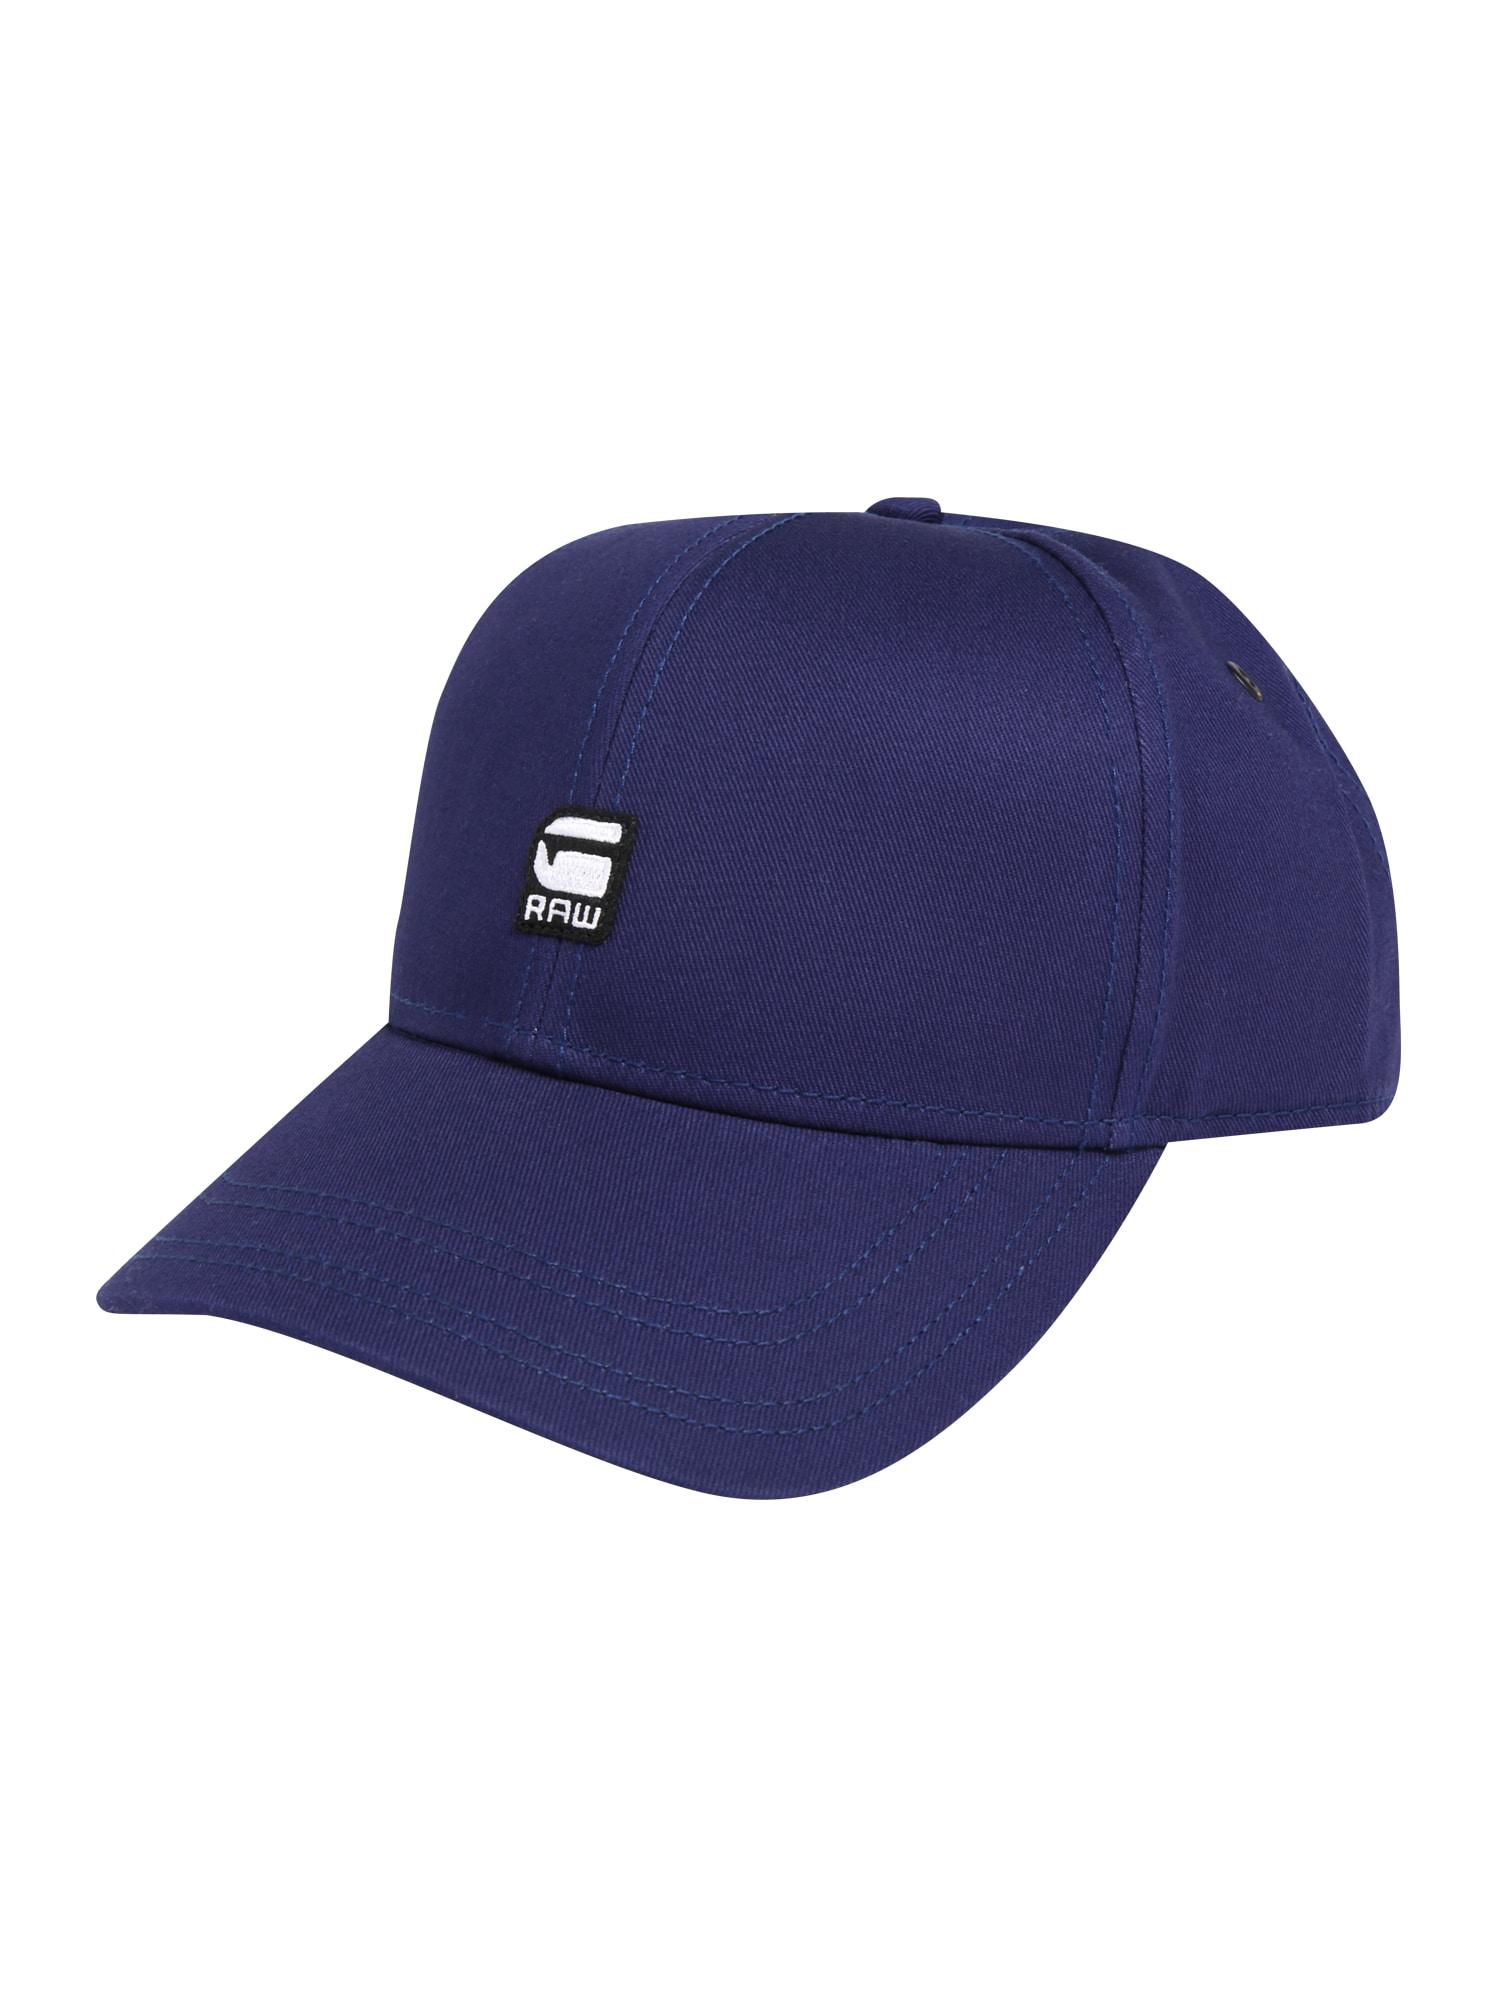 G-Star RAW Kepurė mėlyna